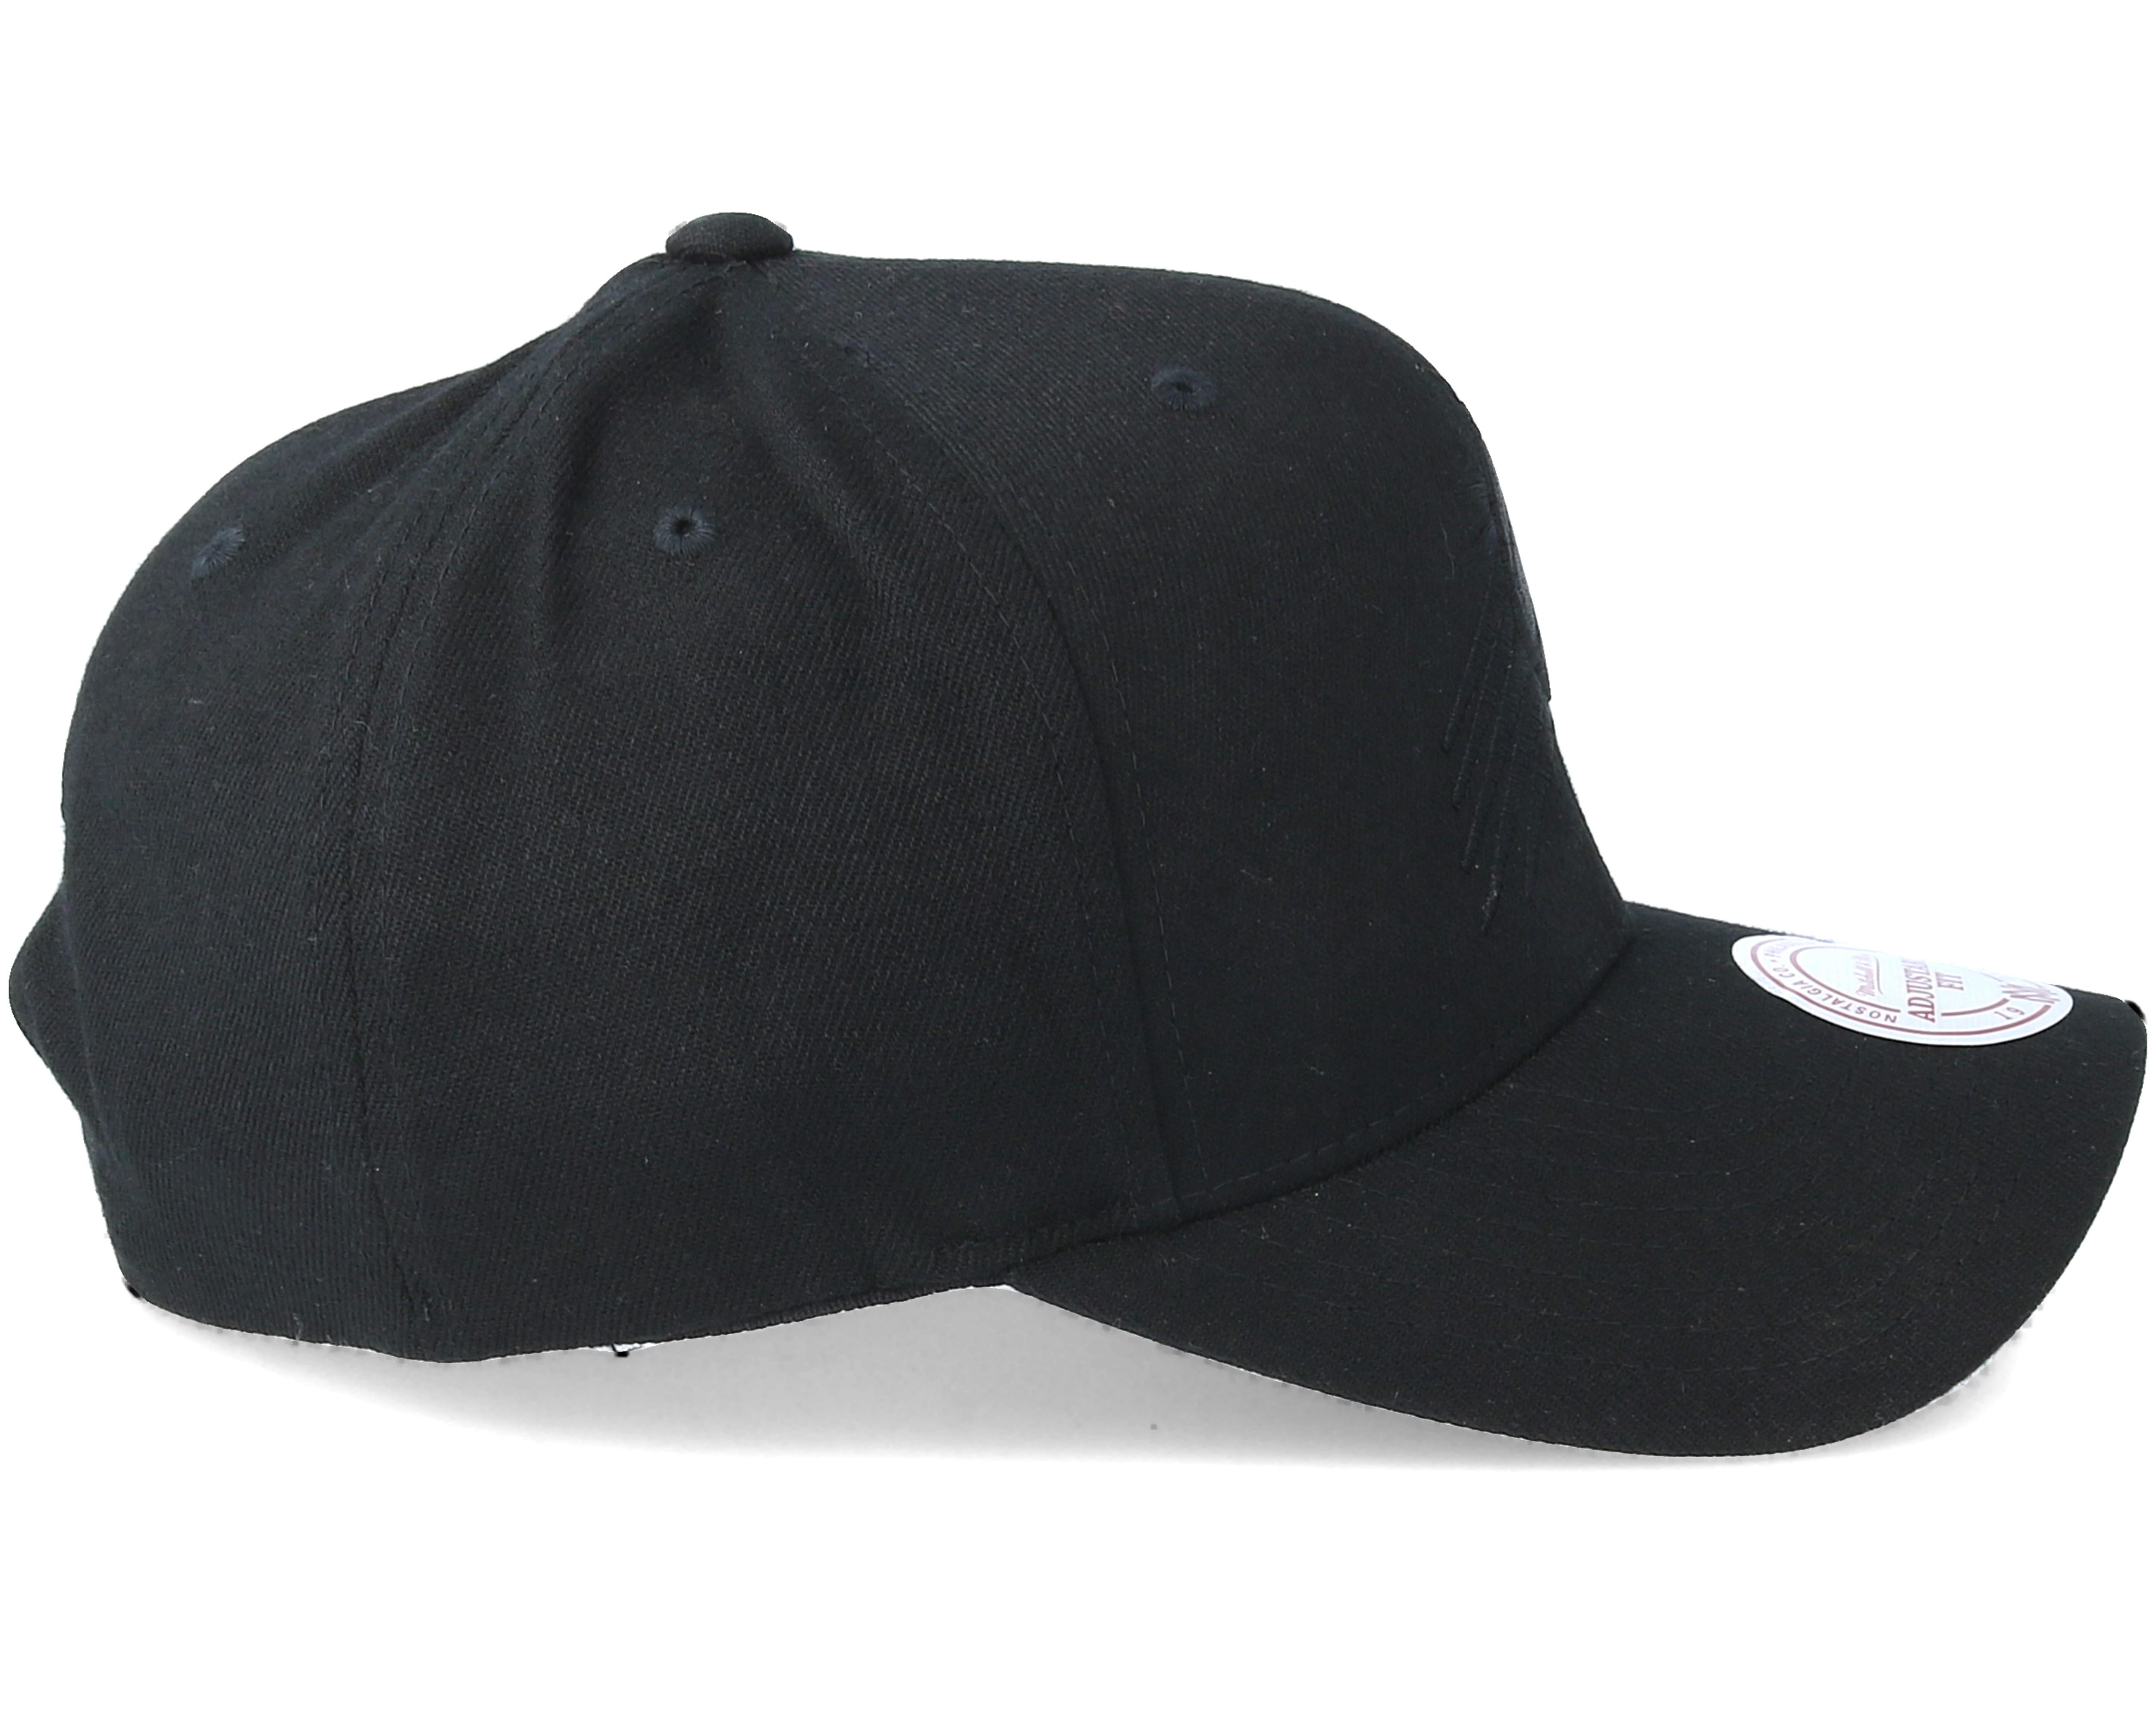 phoenix suns flexfit 110 black black adjustable mitchell. Black Bedroom Furniture Sets. Home Design Ideas